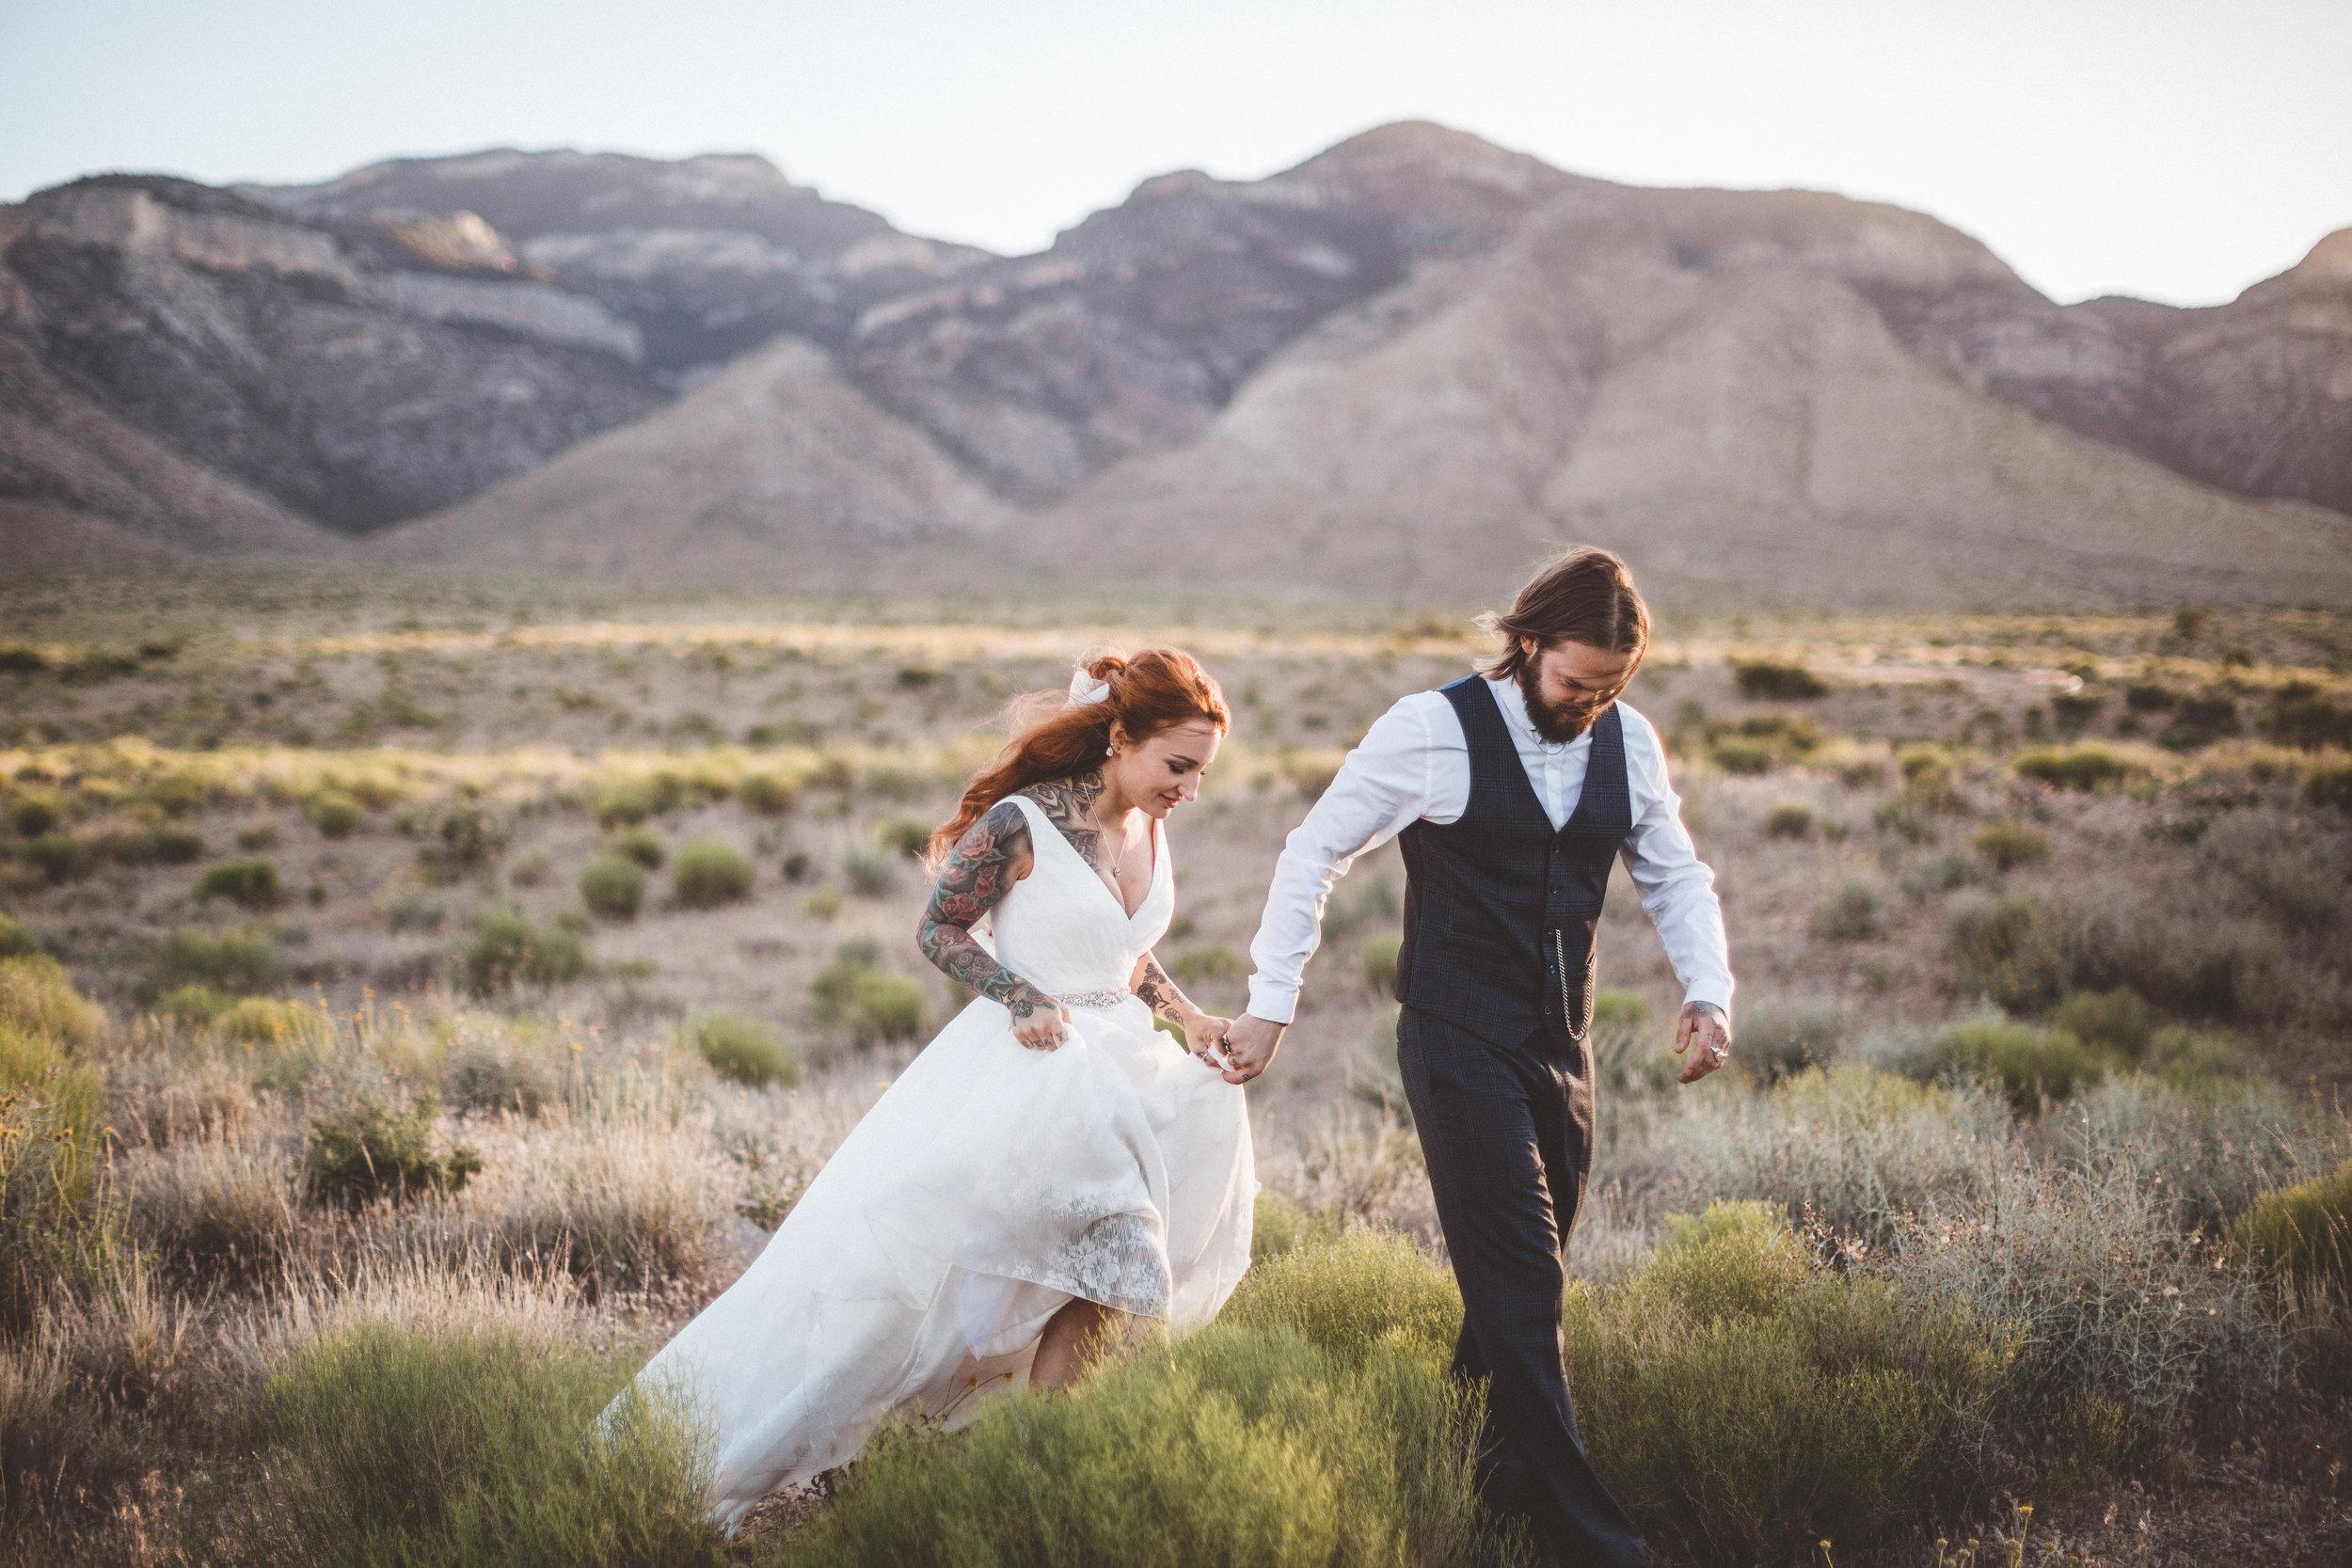 nicoletta-and-adams-rad-las-vegas-desert-elopement18.jpg